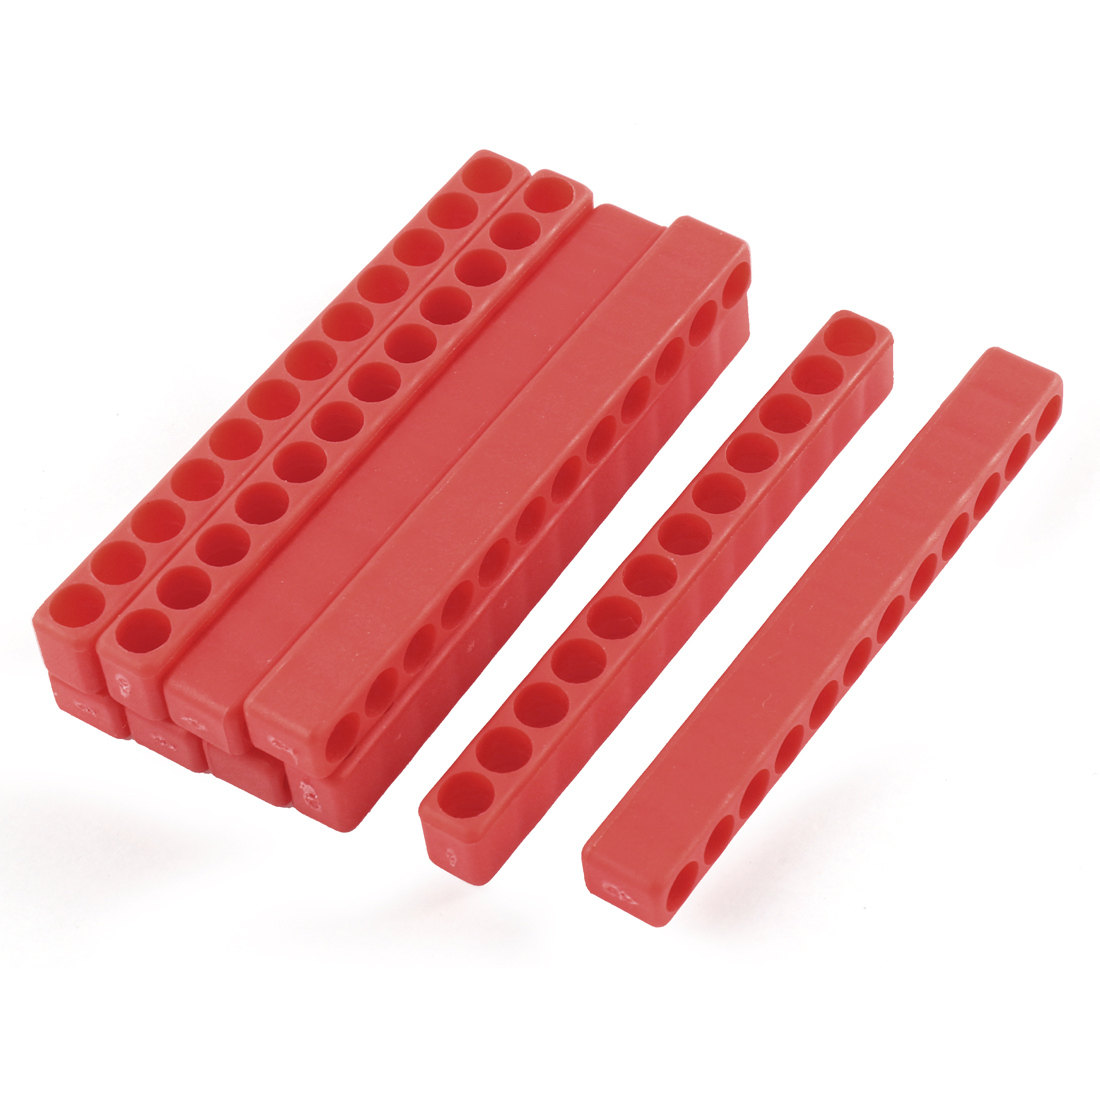 100mm Long 7mm Dia 12-Hole Screwdriver Bit Holder Block Red 10 Pcs